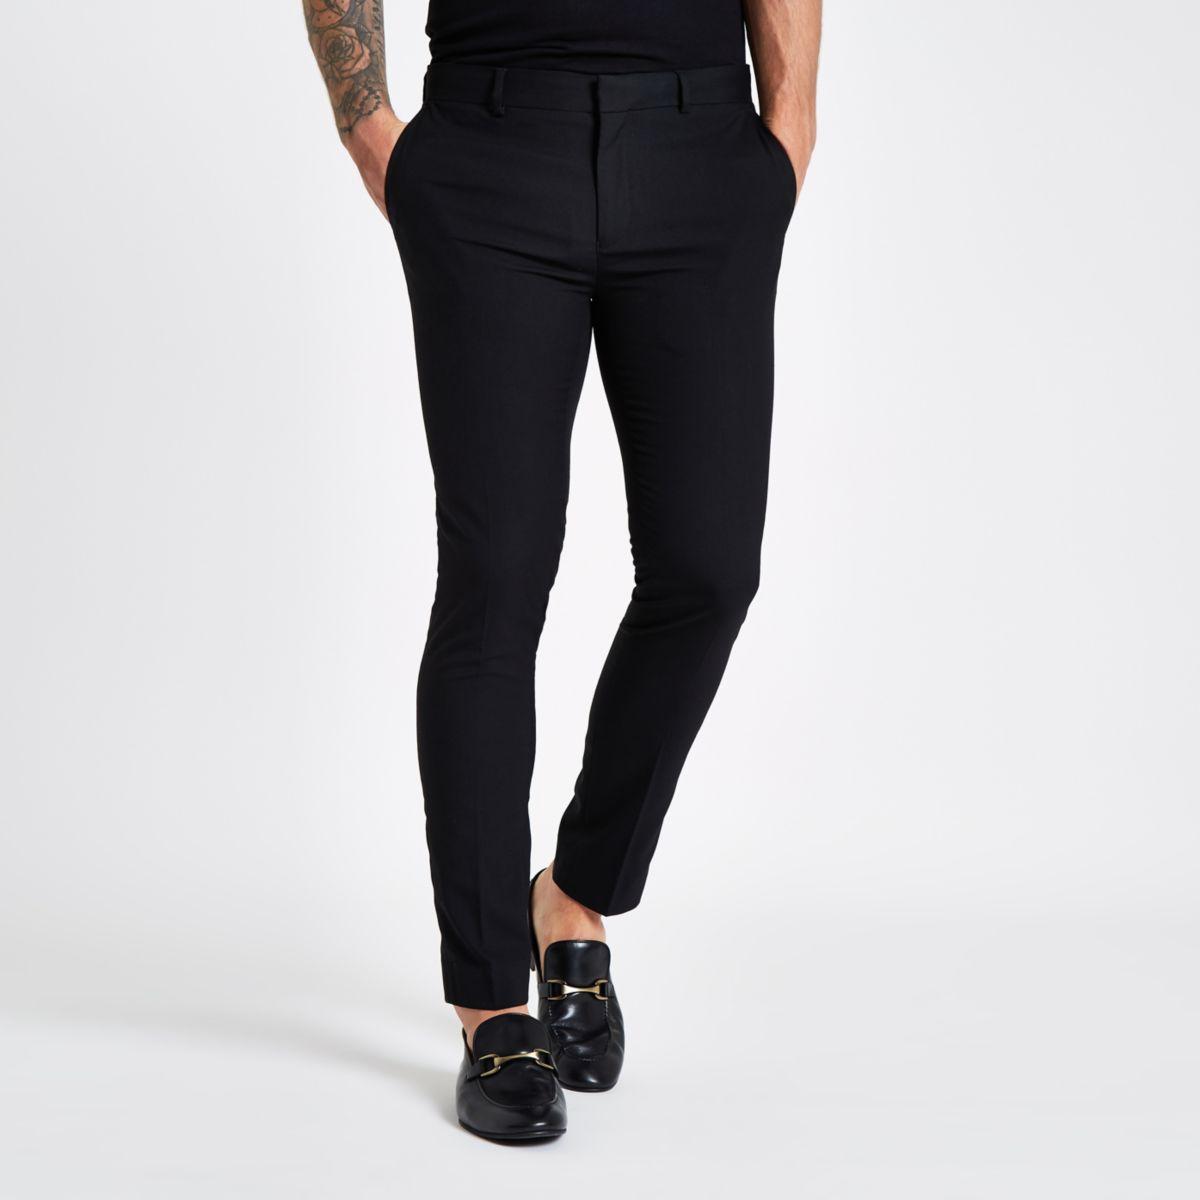 Zwarte superskinny nette broek